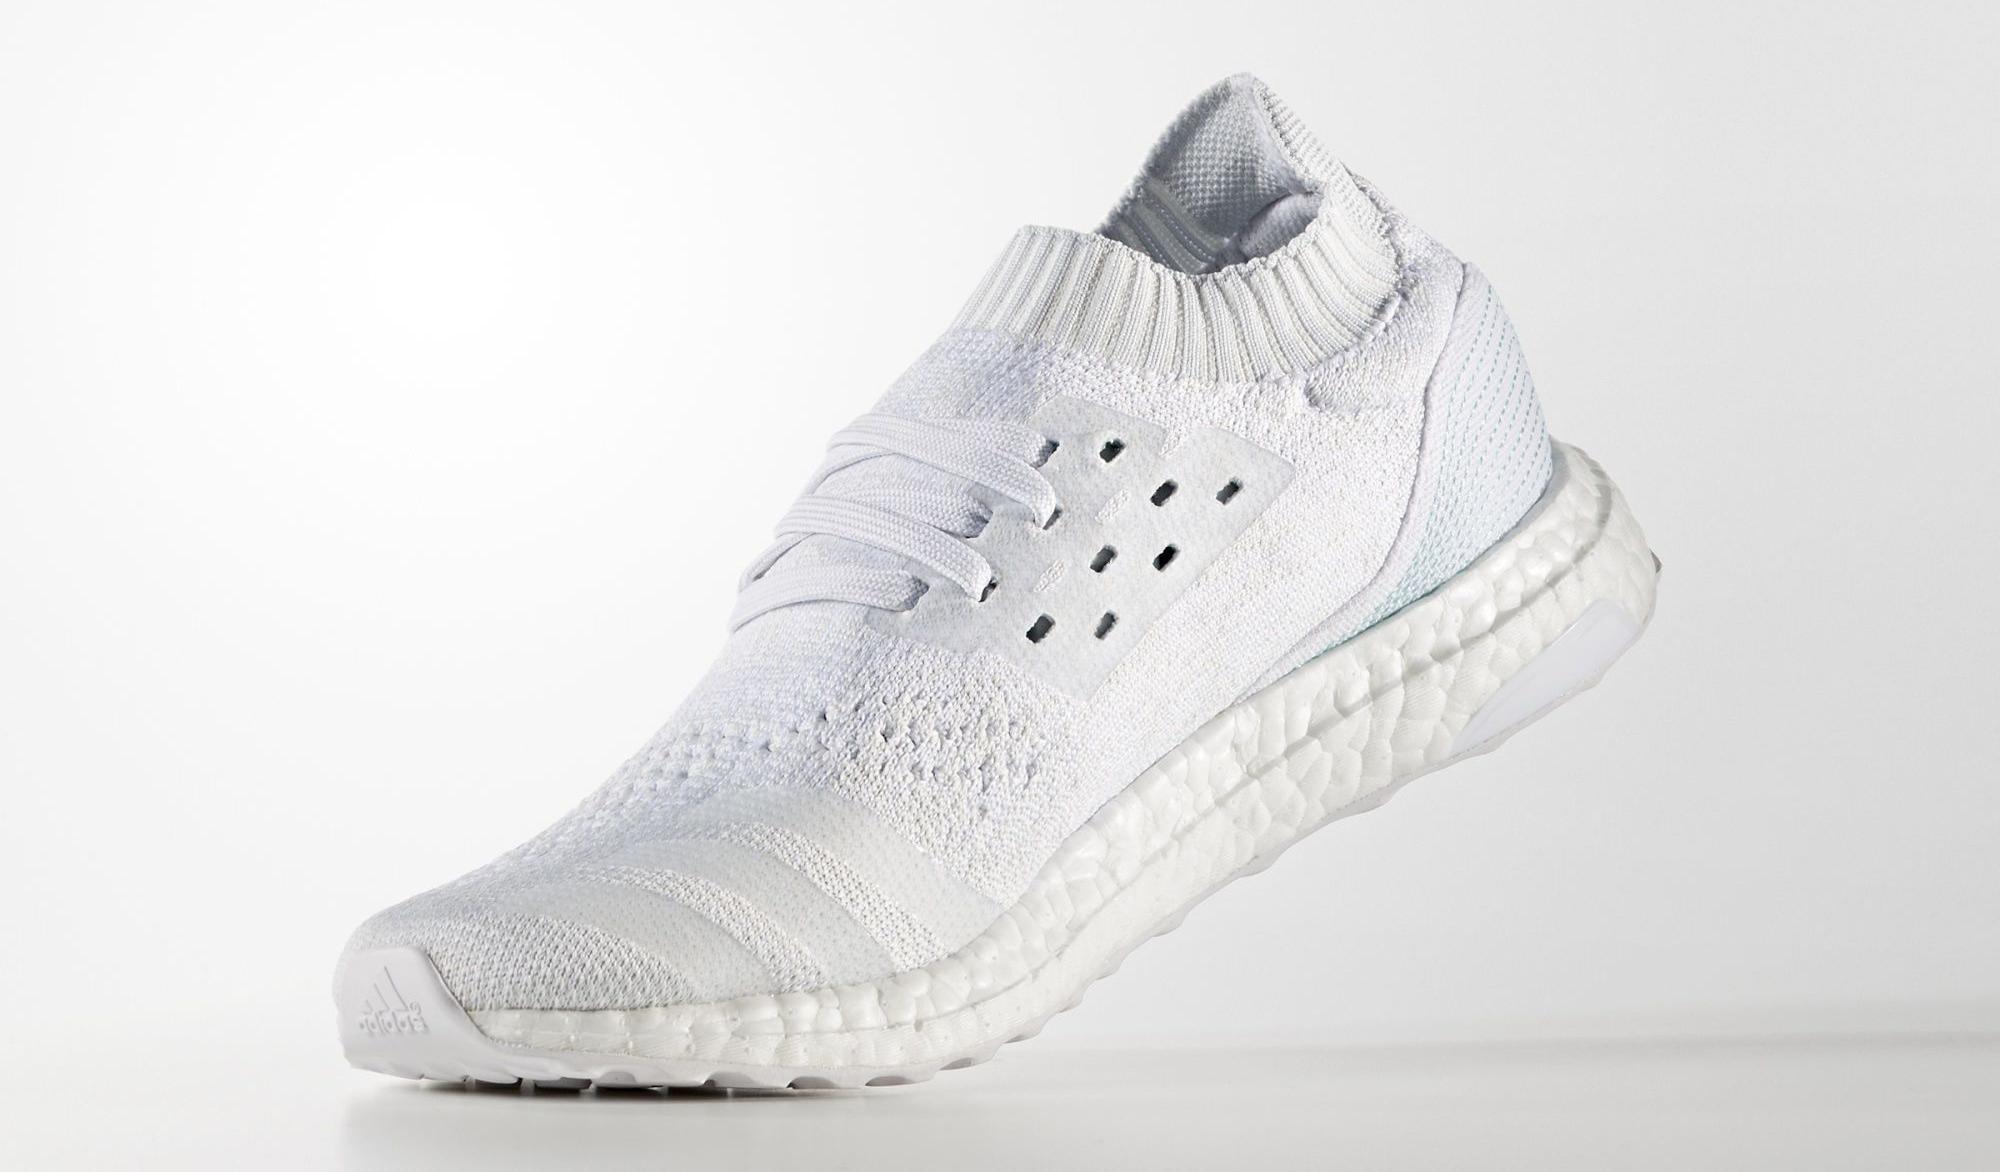 Image via Adidas Parley Adidas Ultra Boost Uncaged Medial